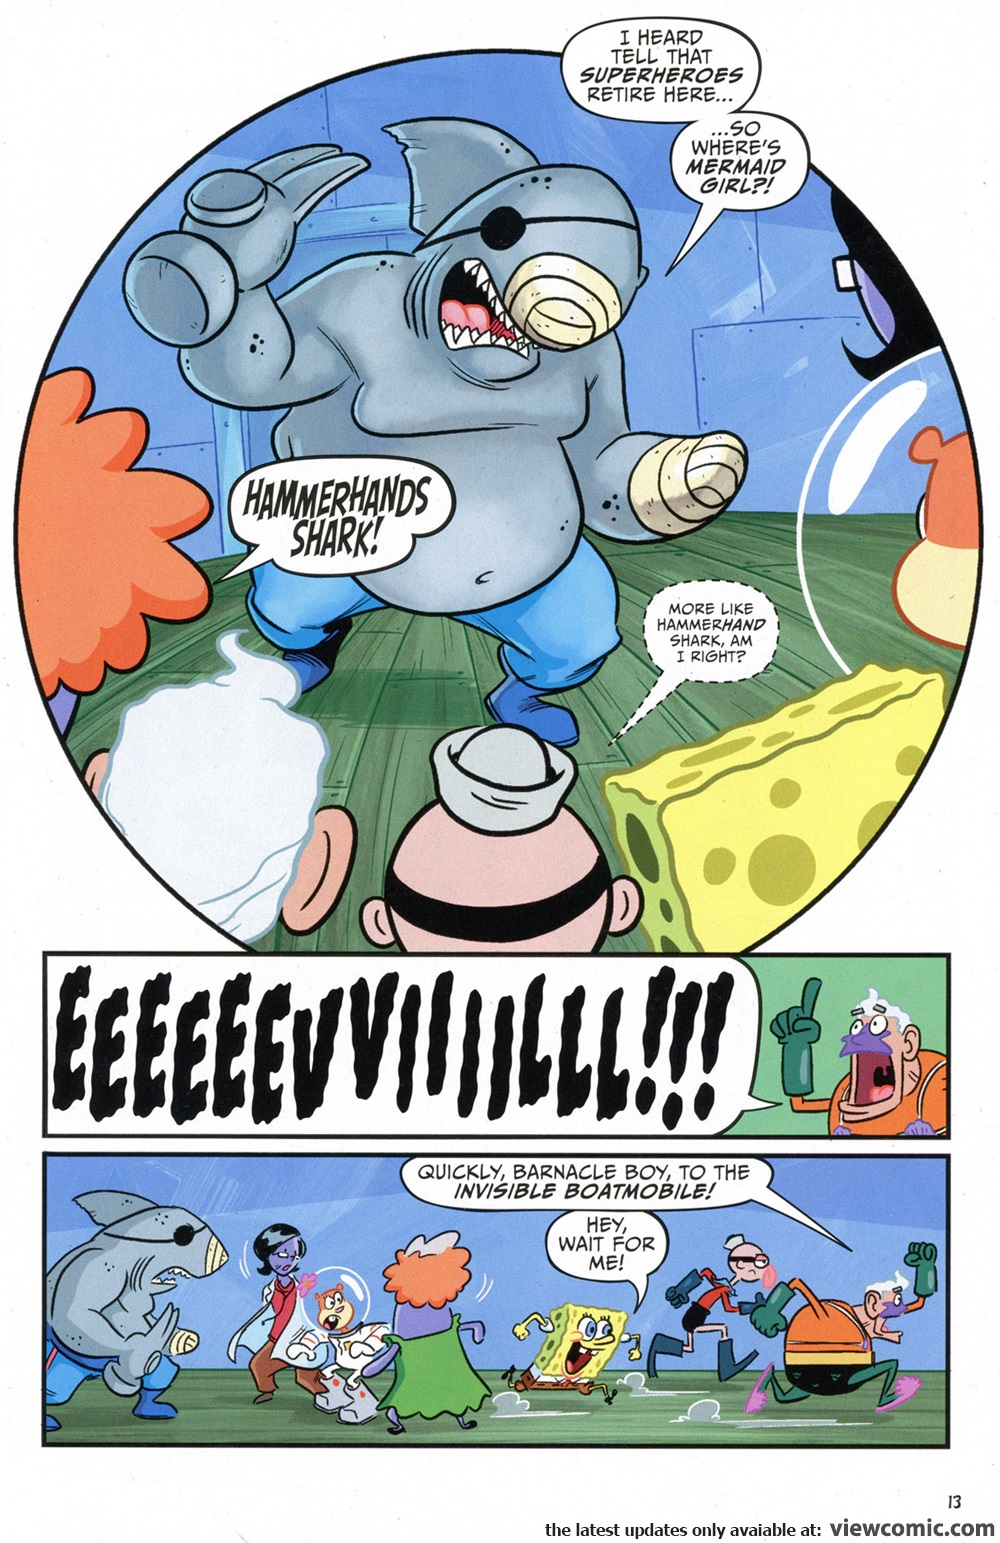 spongebob comics 063 2016 u2026 u2026 u2026 u2026 u2026 u2026 u2026 view comic